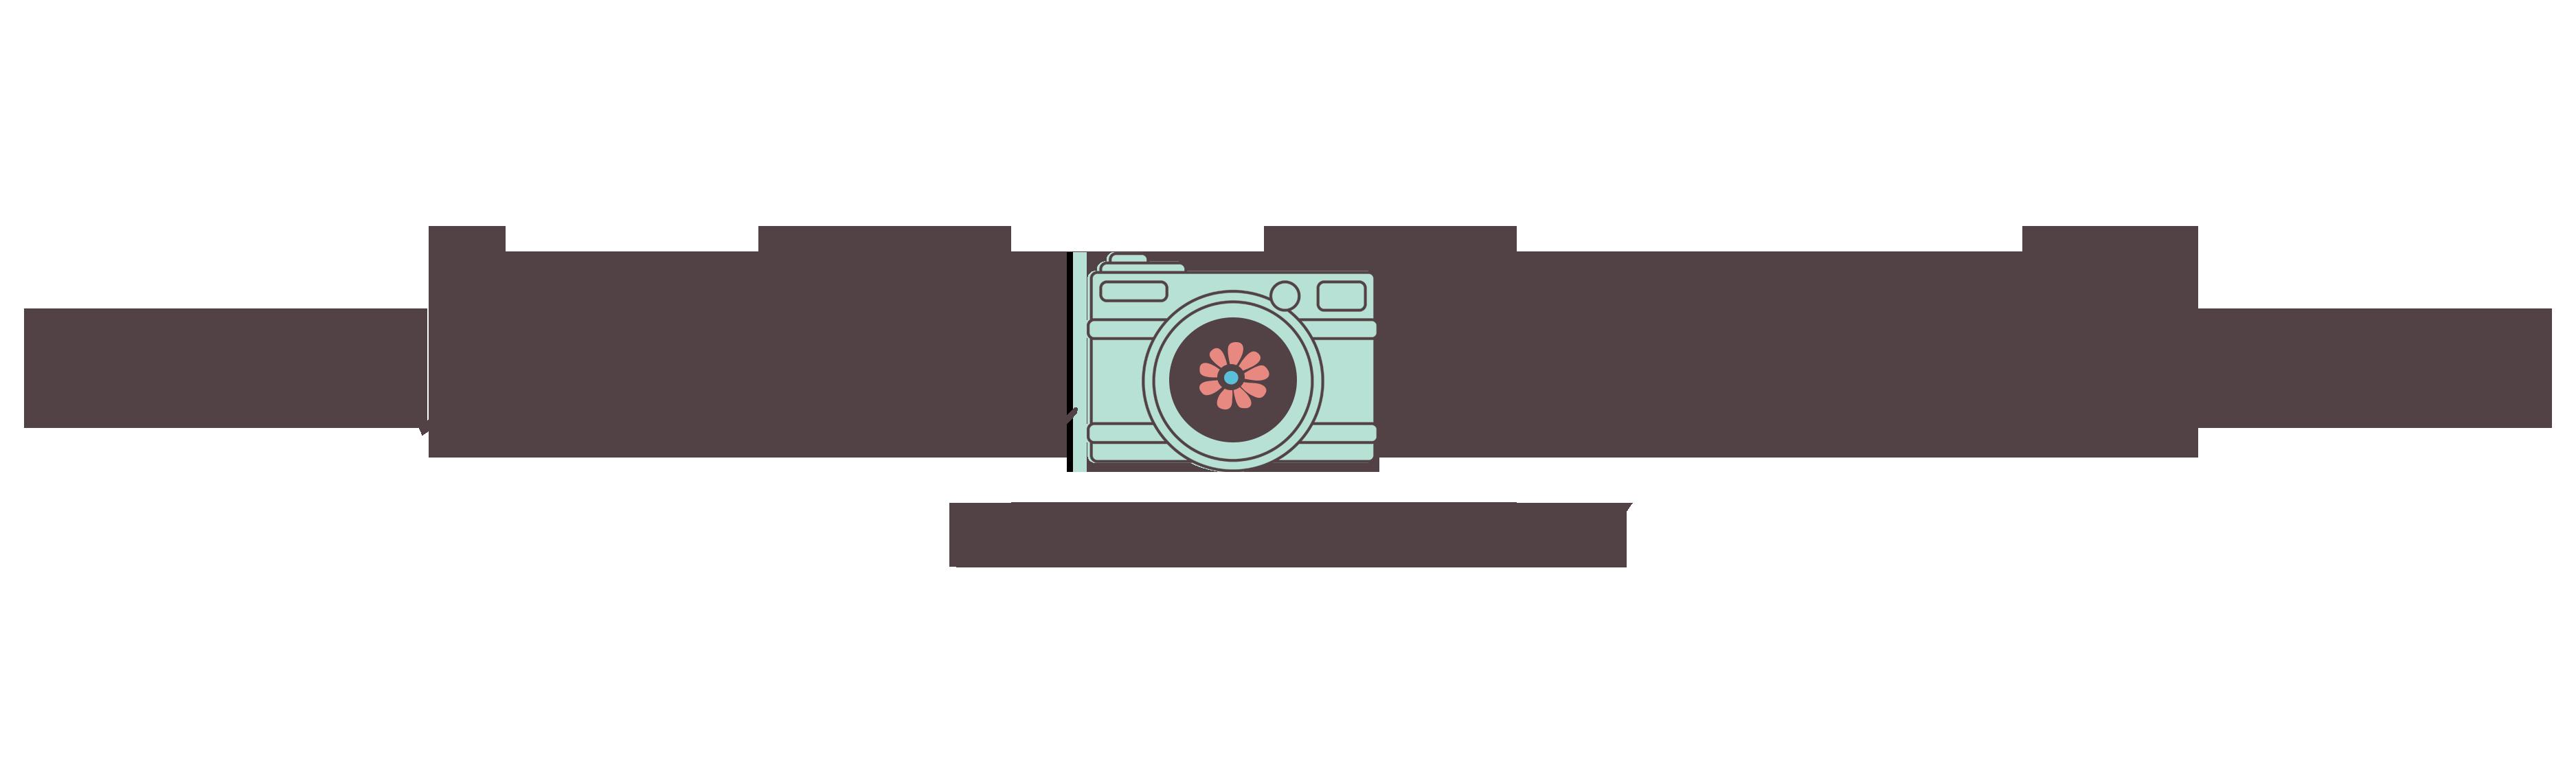 photography camera logo png Camera logo, Photography